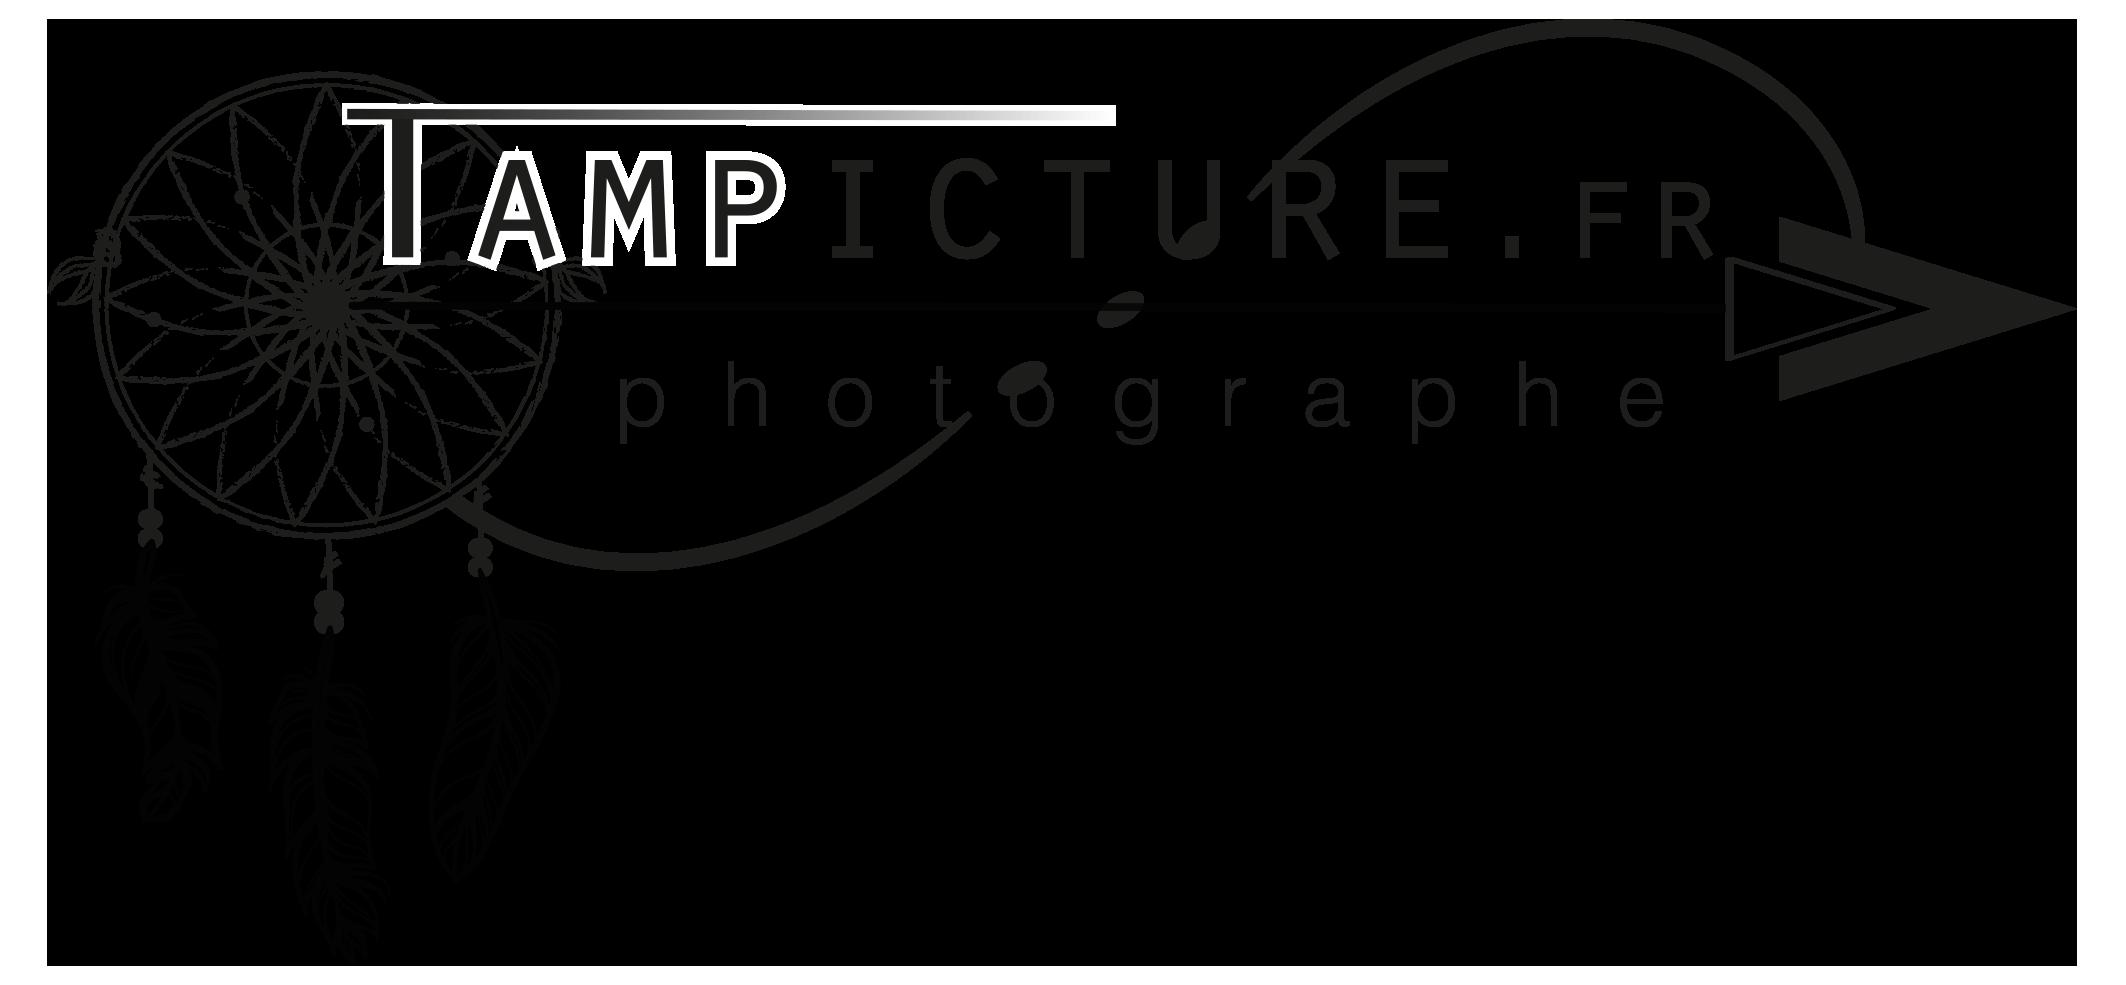 Tampicture